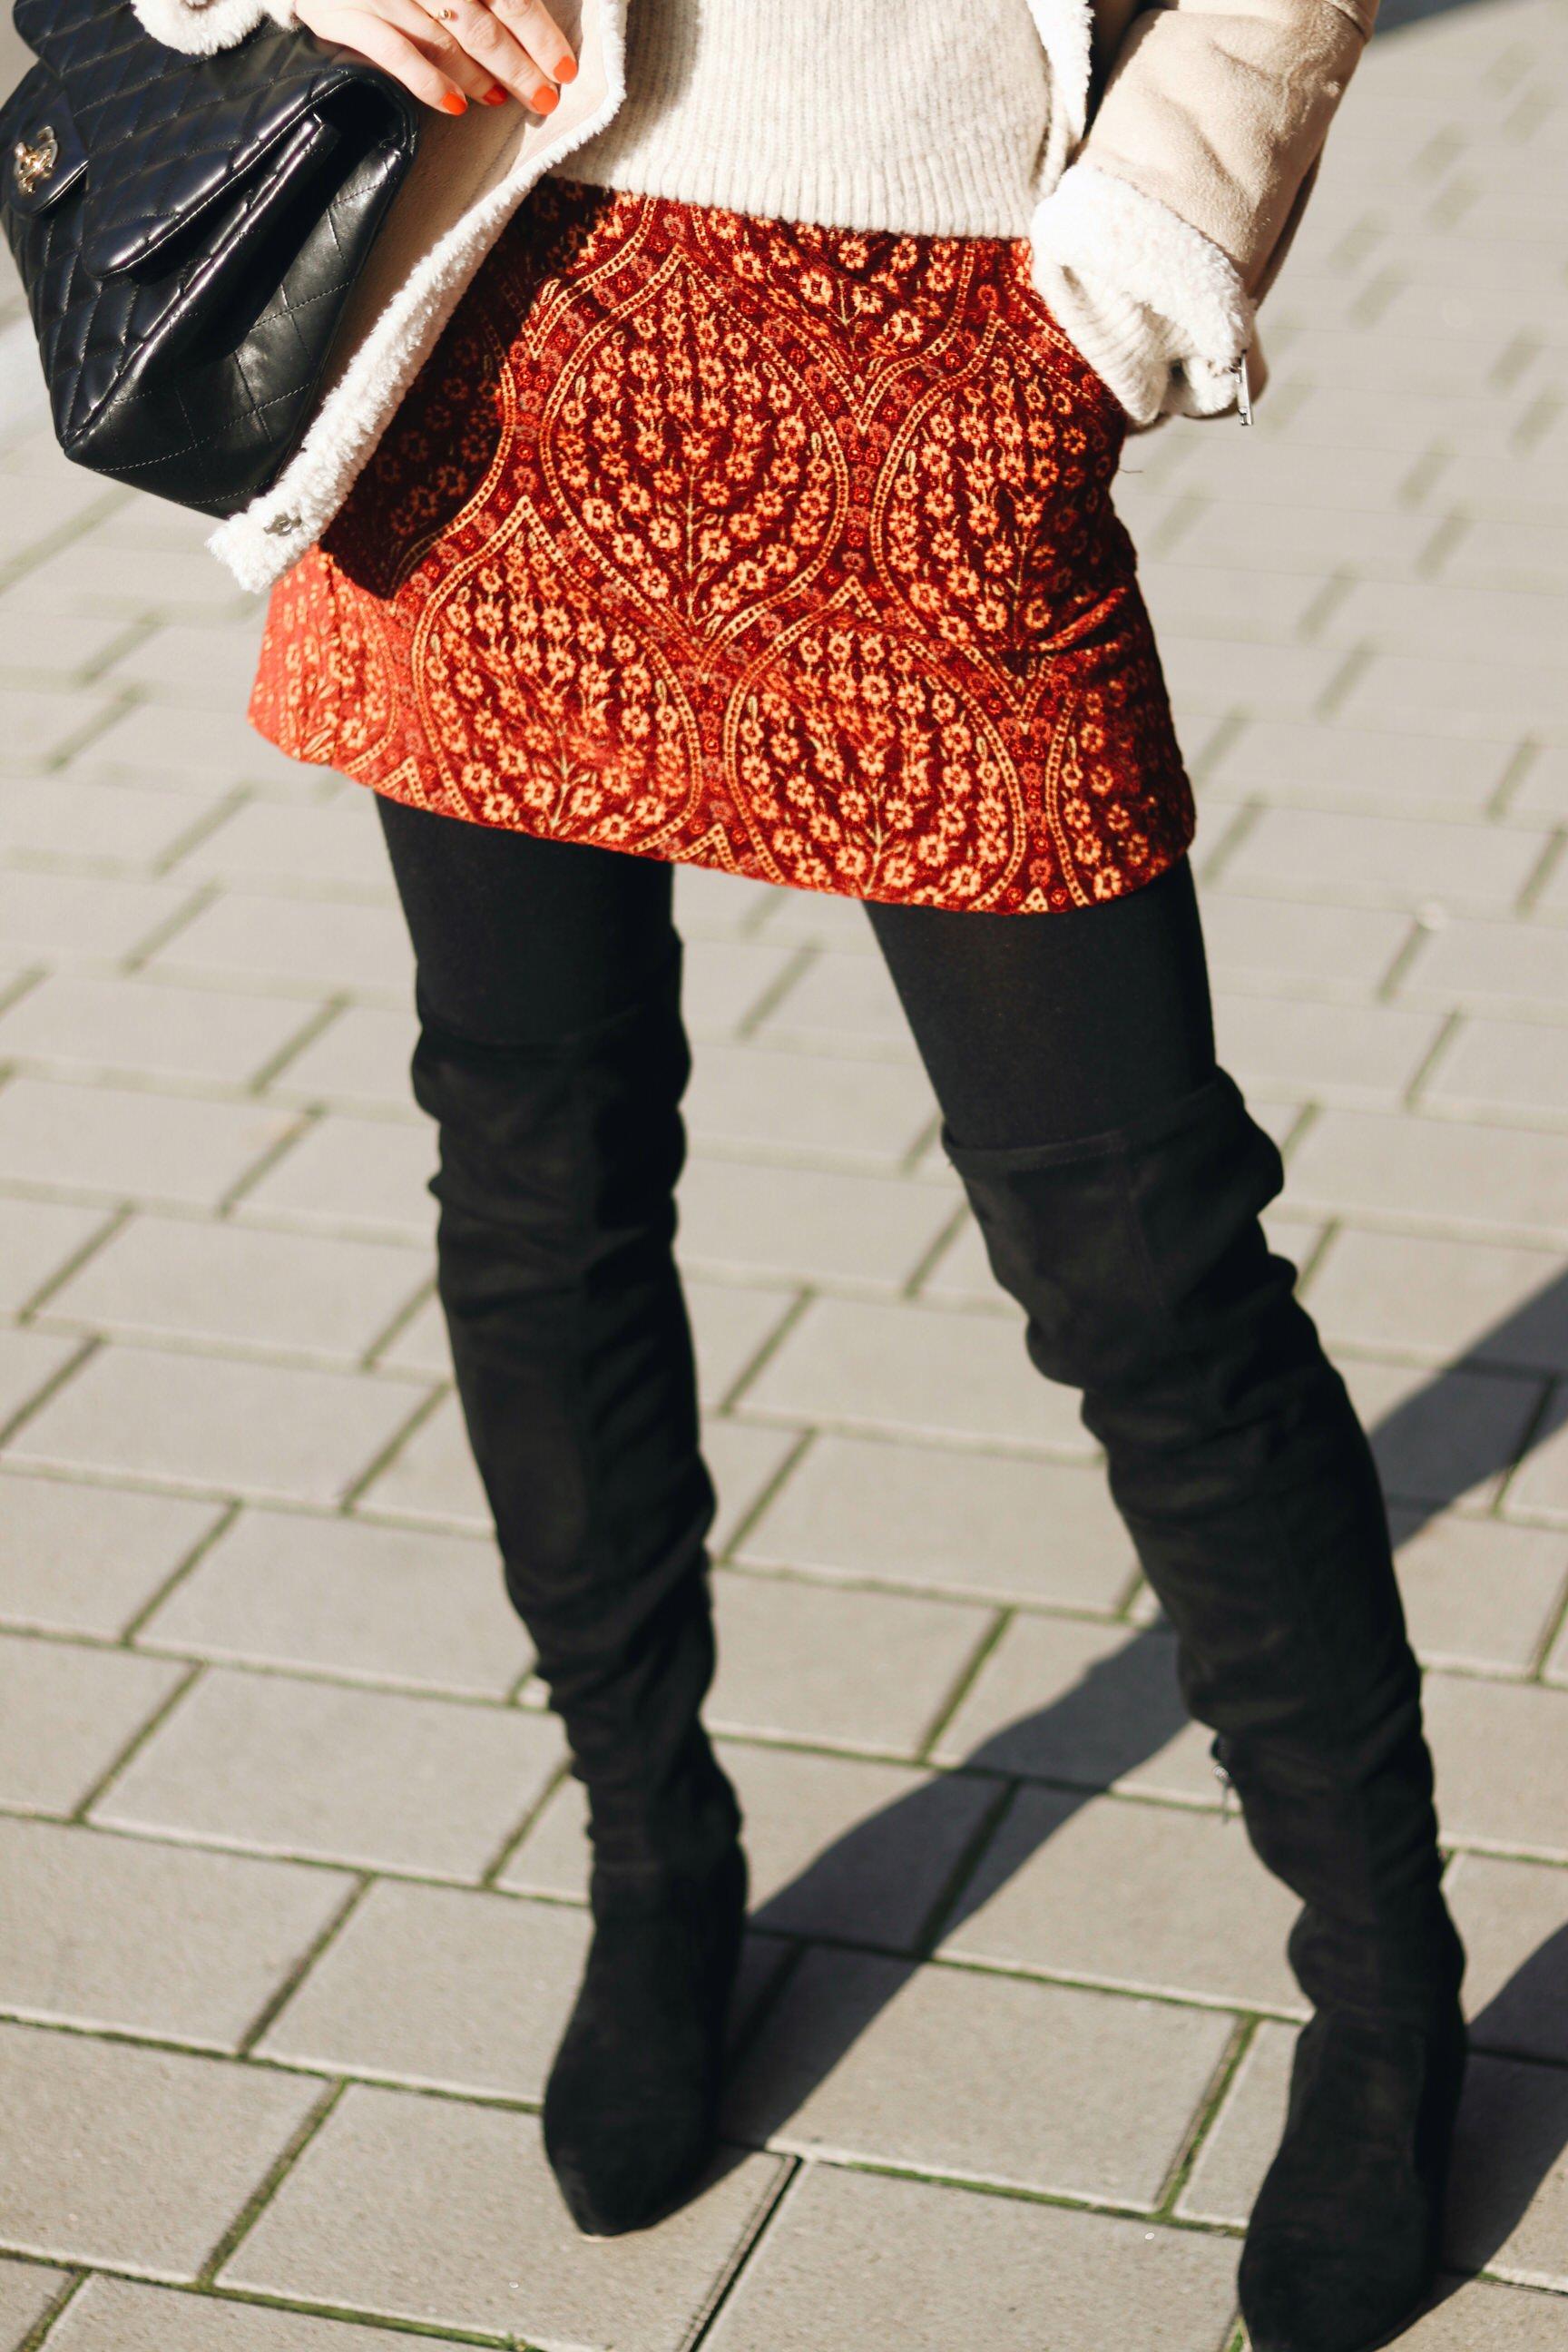 Minirock Overknees Schwarz kombinieren Winter Outfit Streetstyle look Fashionblog Modeblog